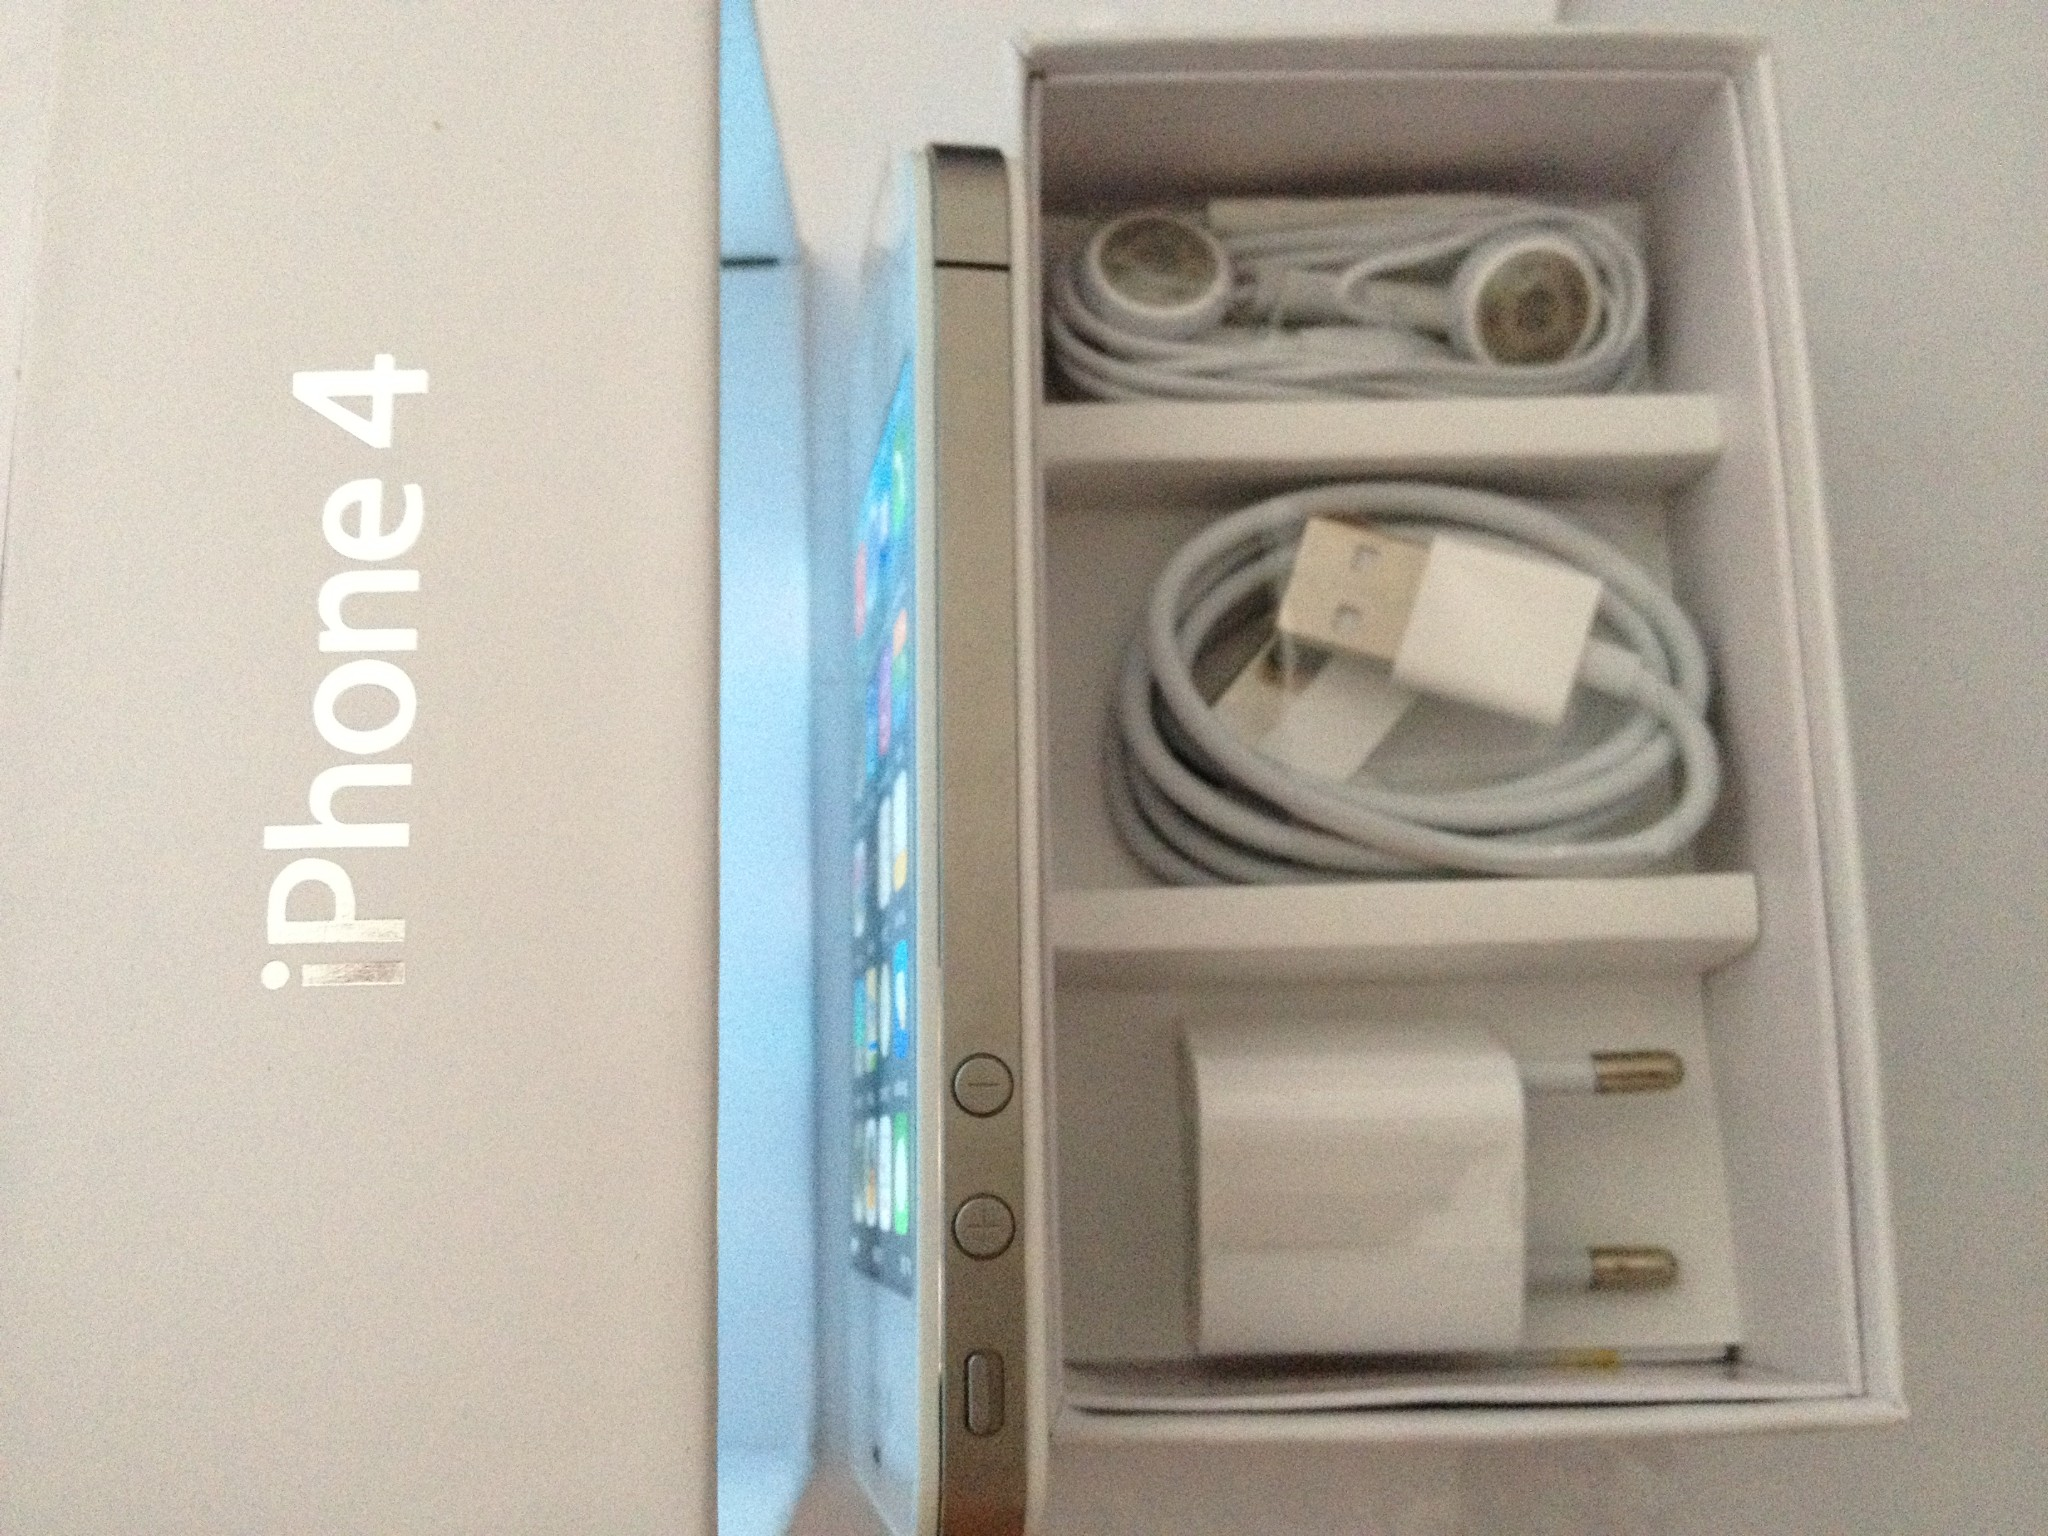 Harga Iphone 5 Kalo Dijual